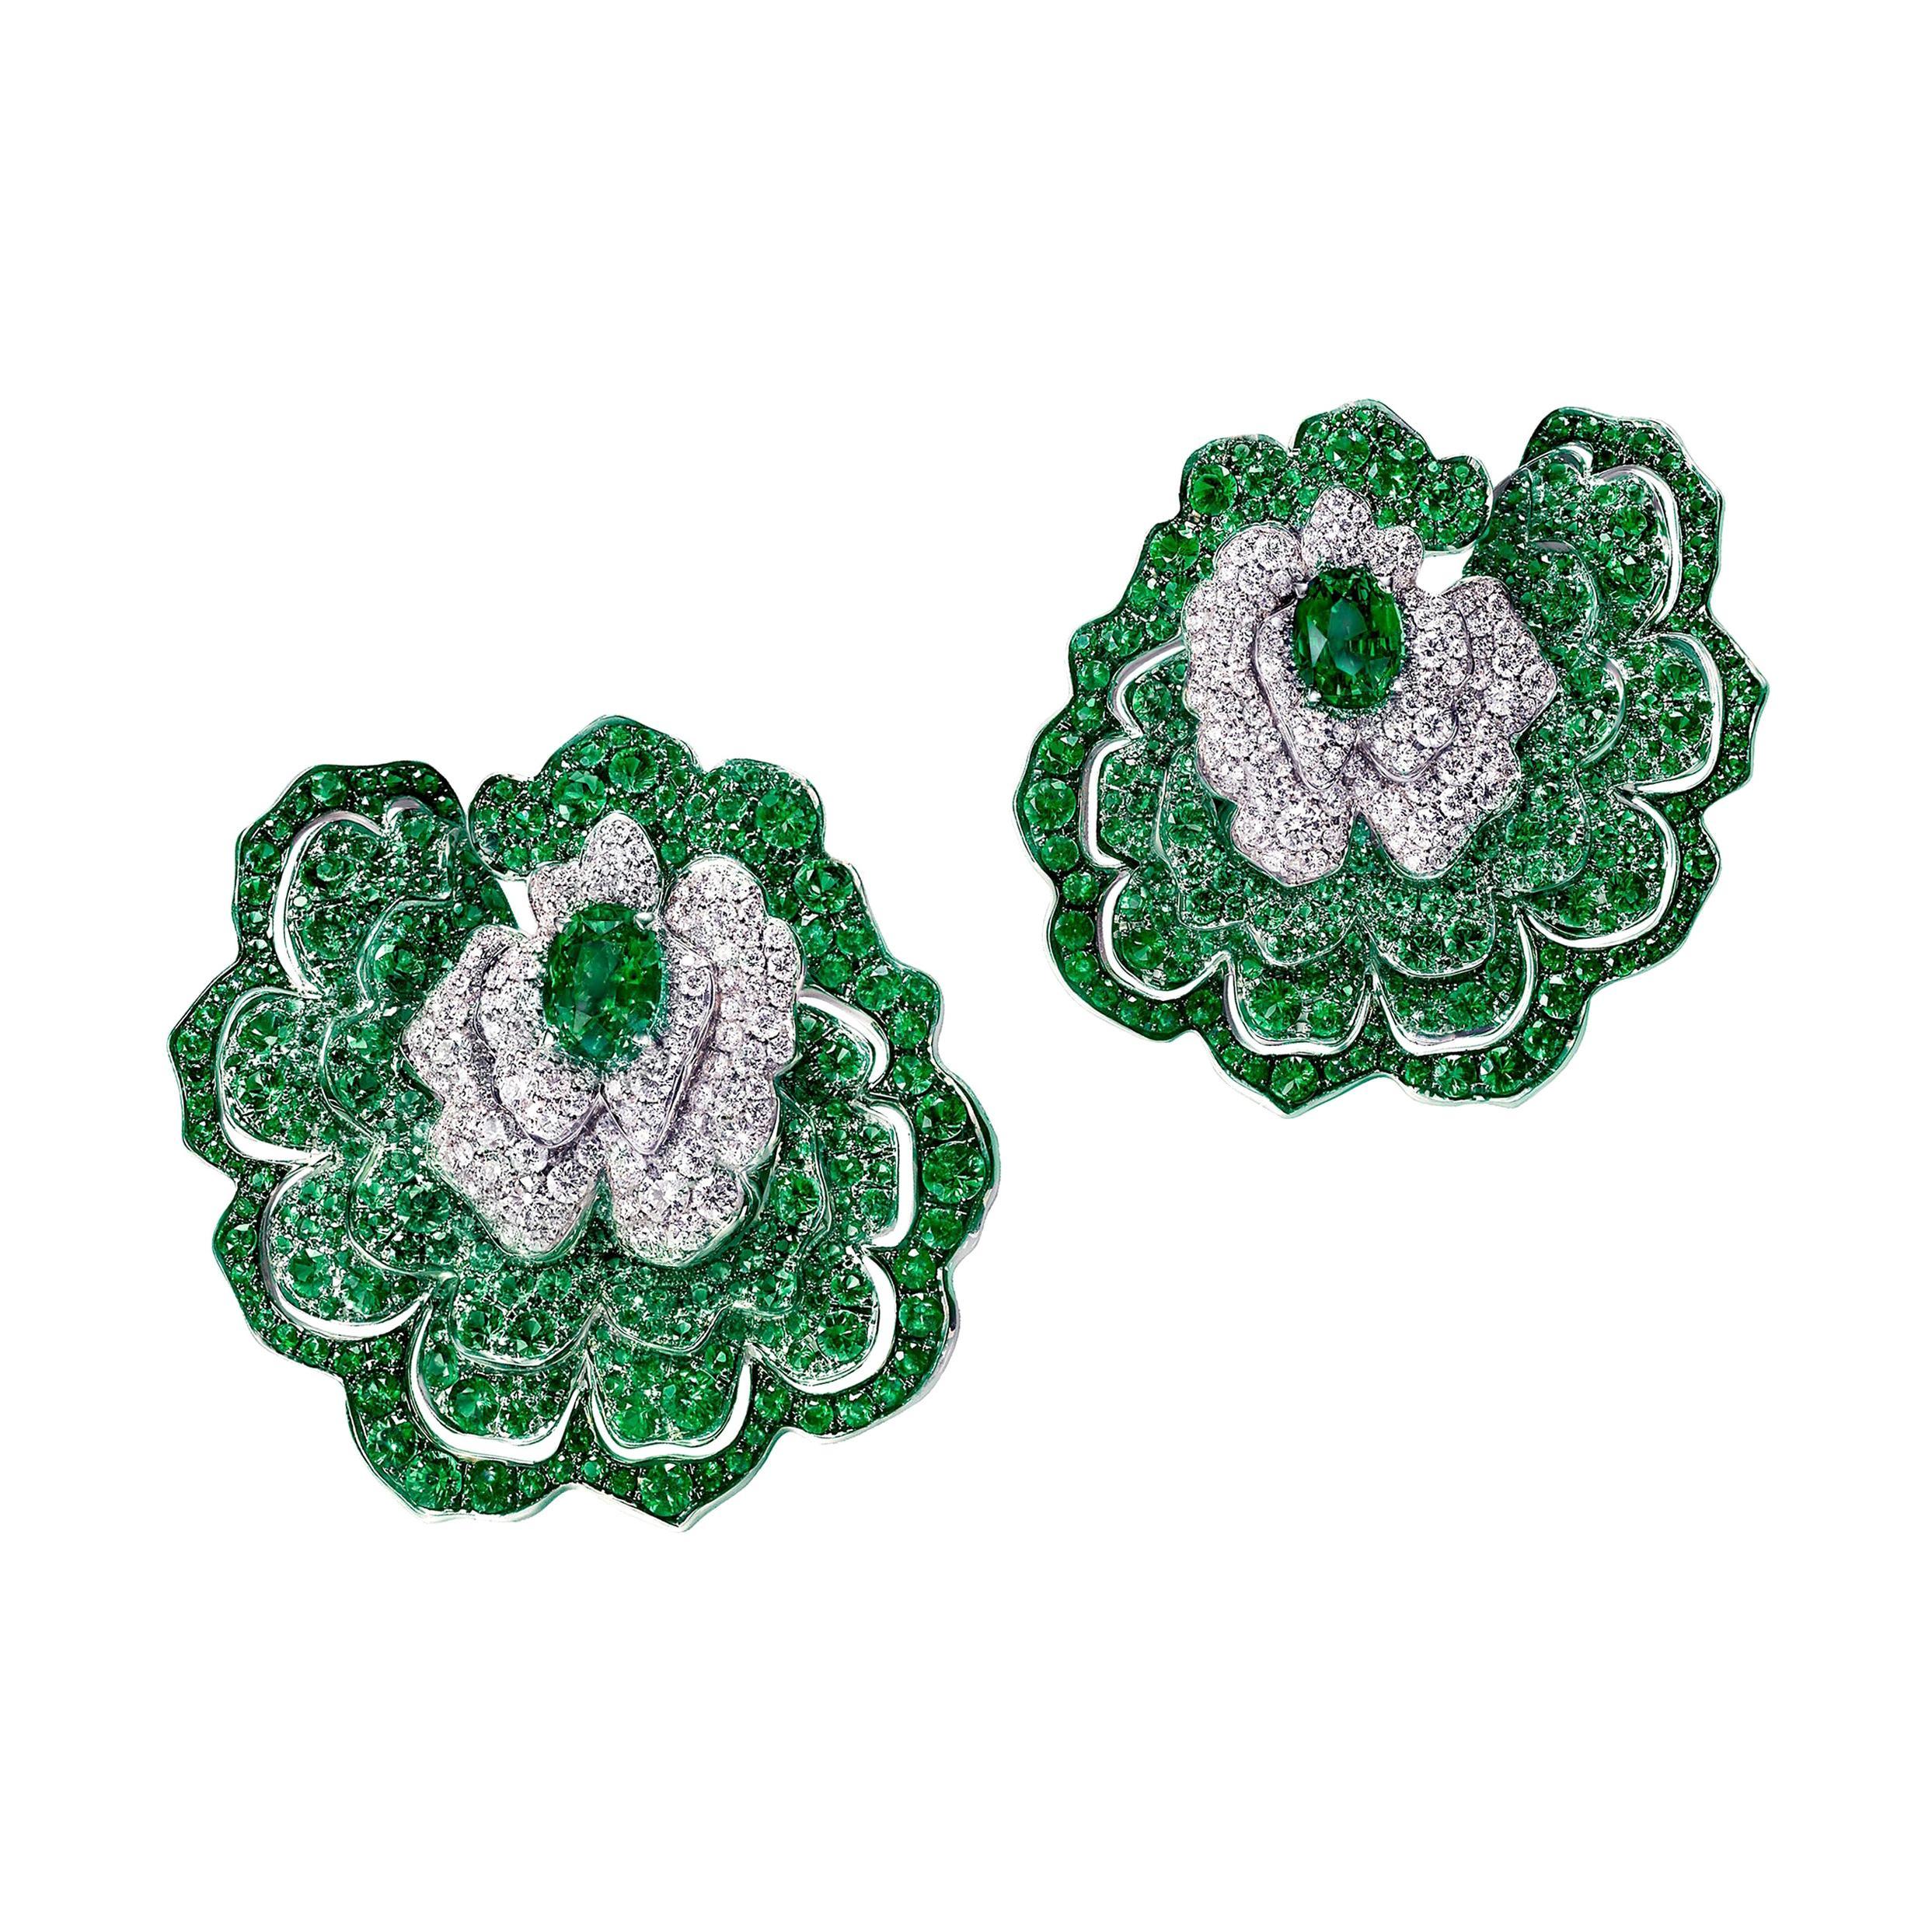 18 Karat White Gold, White Diamonds and Emeralds Earrings